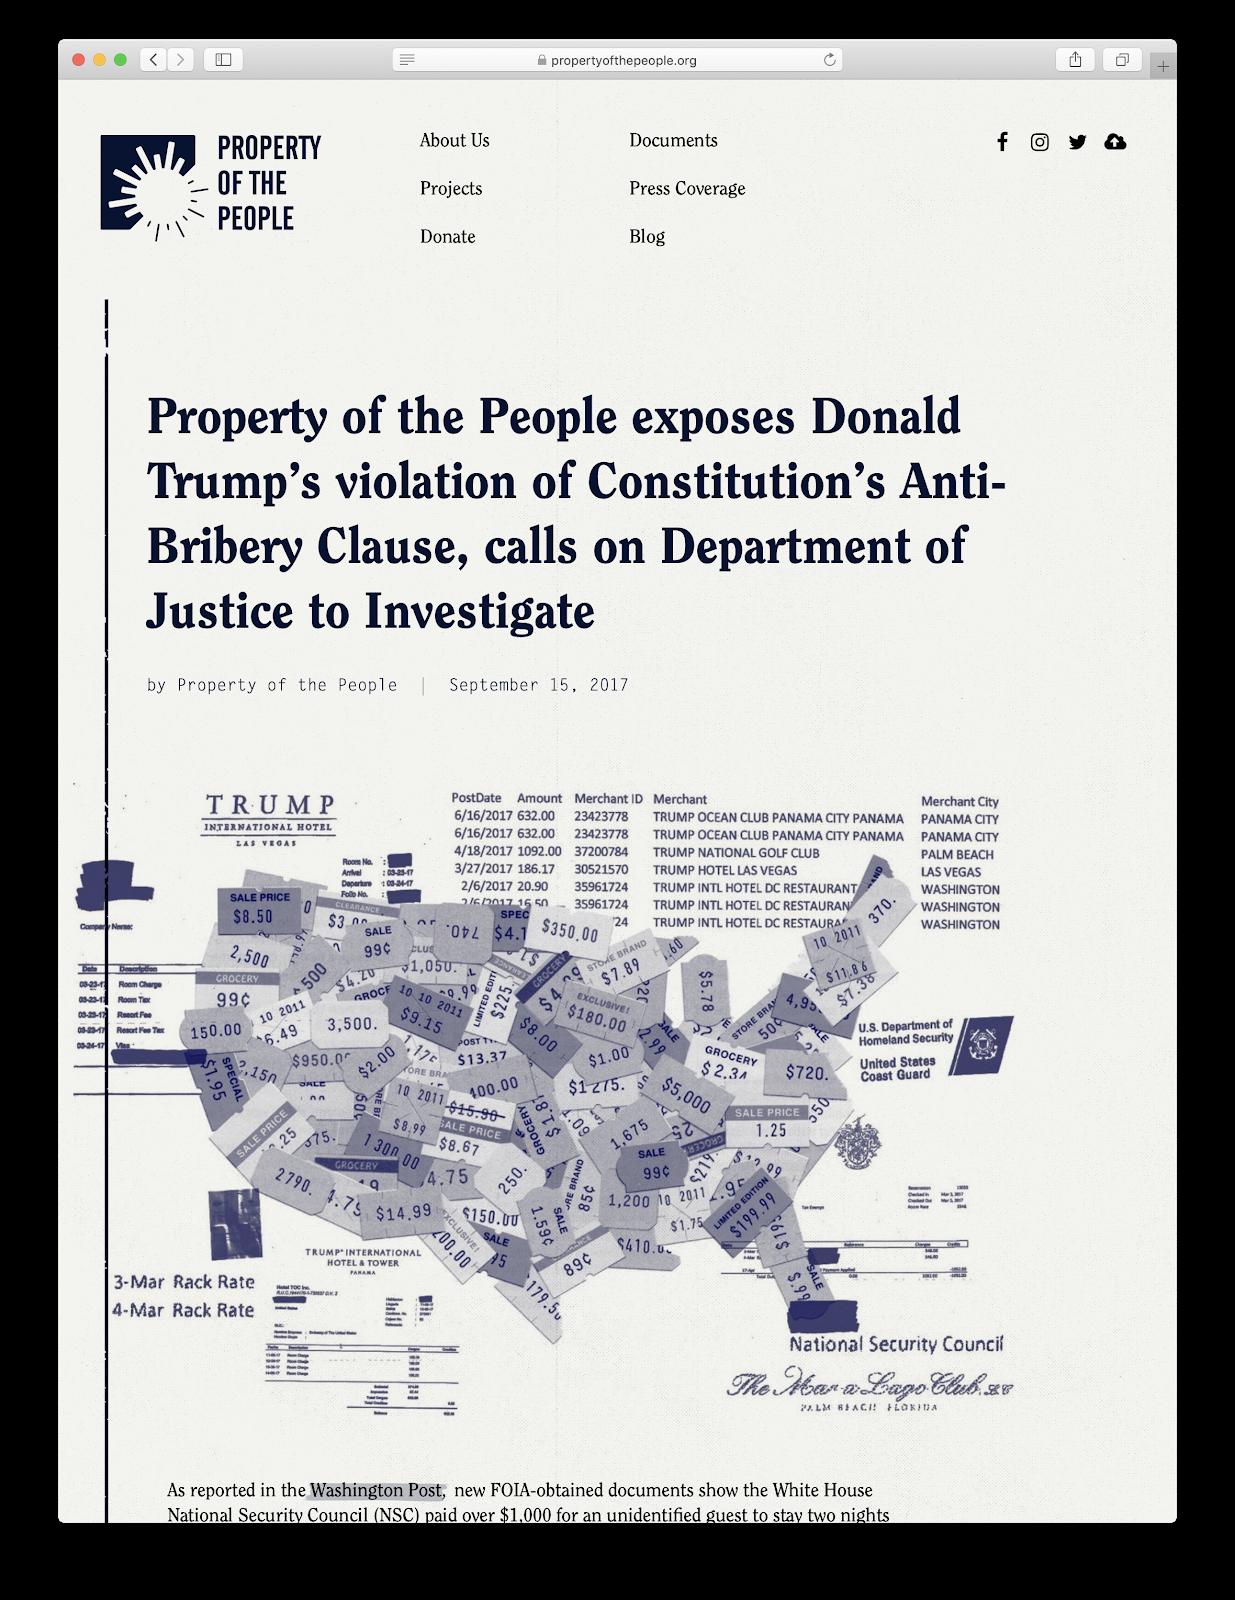 Screenshot 2018-12-28 17.19.18.png